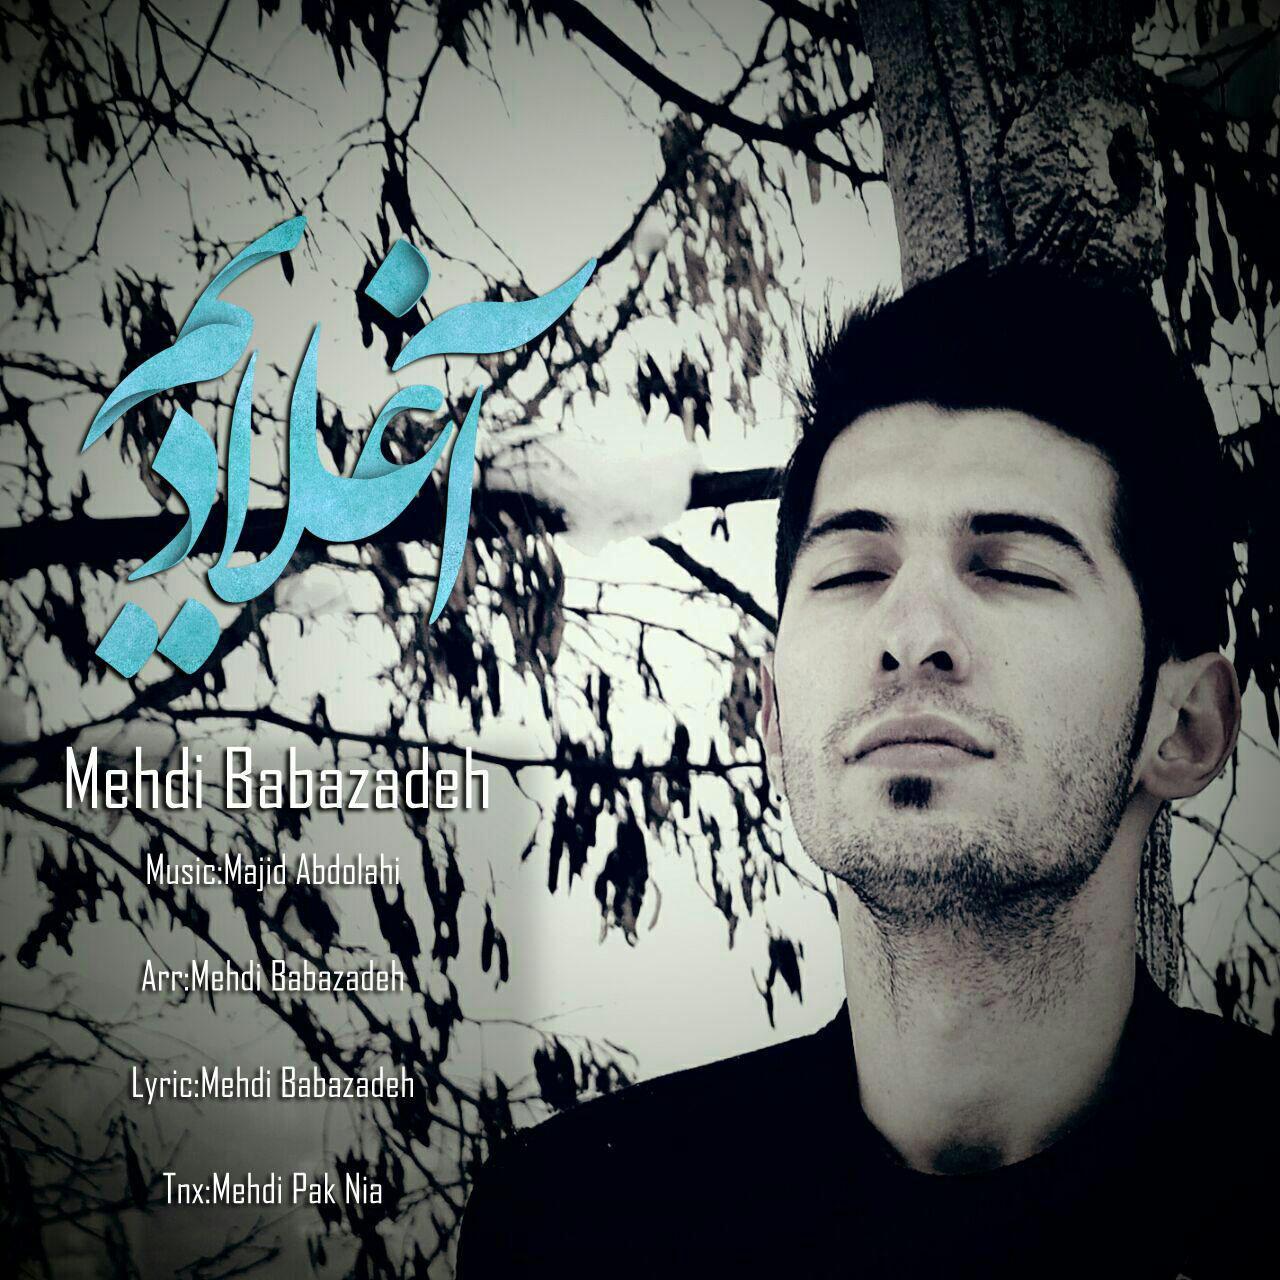 http://s8.picofile.com/file/8301126626/033Mehdi_Babazadeh_Aghladim.jpg